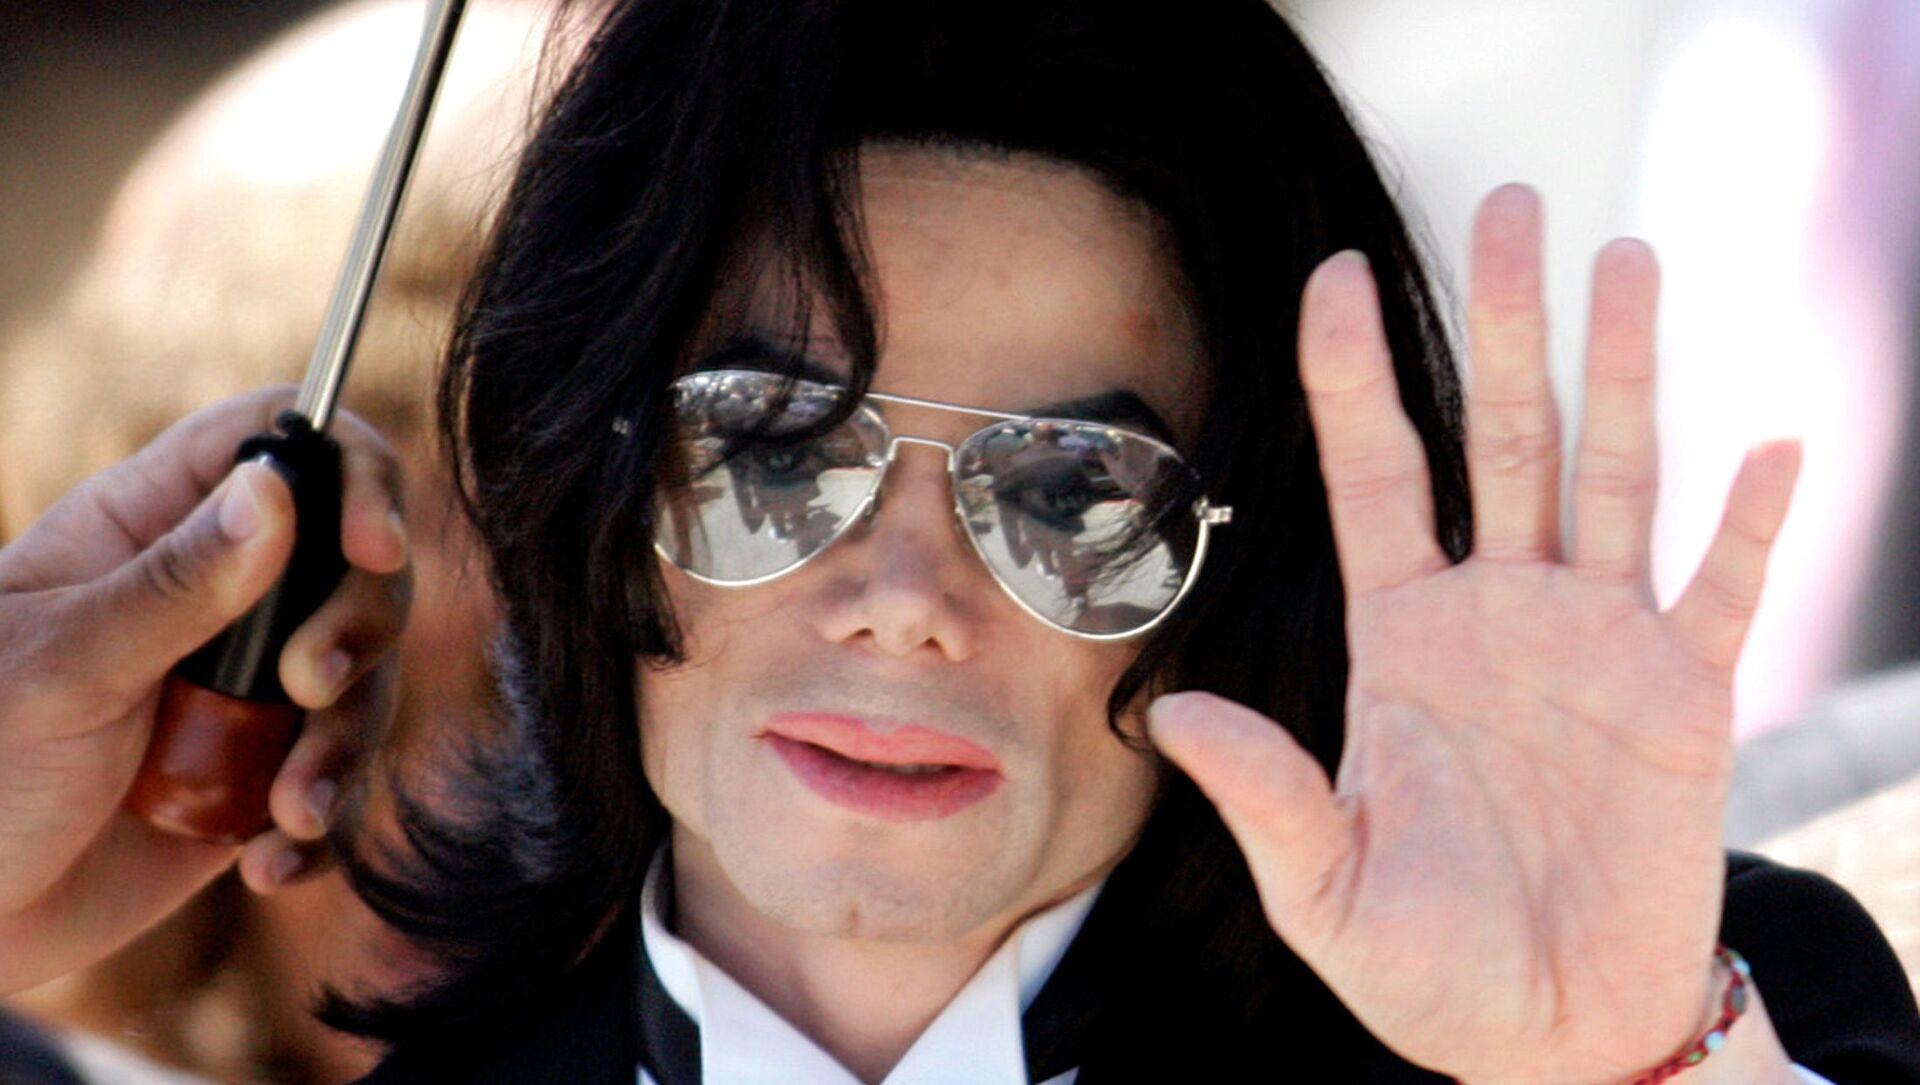 El cantante Michael Jackson - Sputnik Mundo, 1920, 25.06.2019